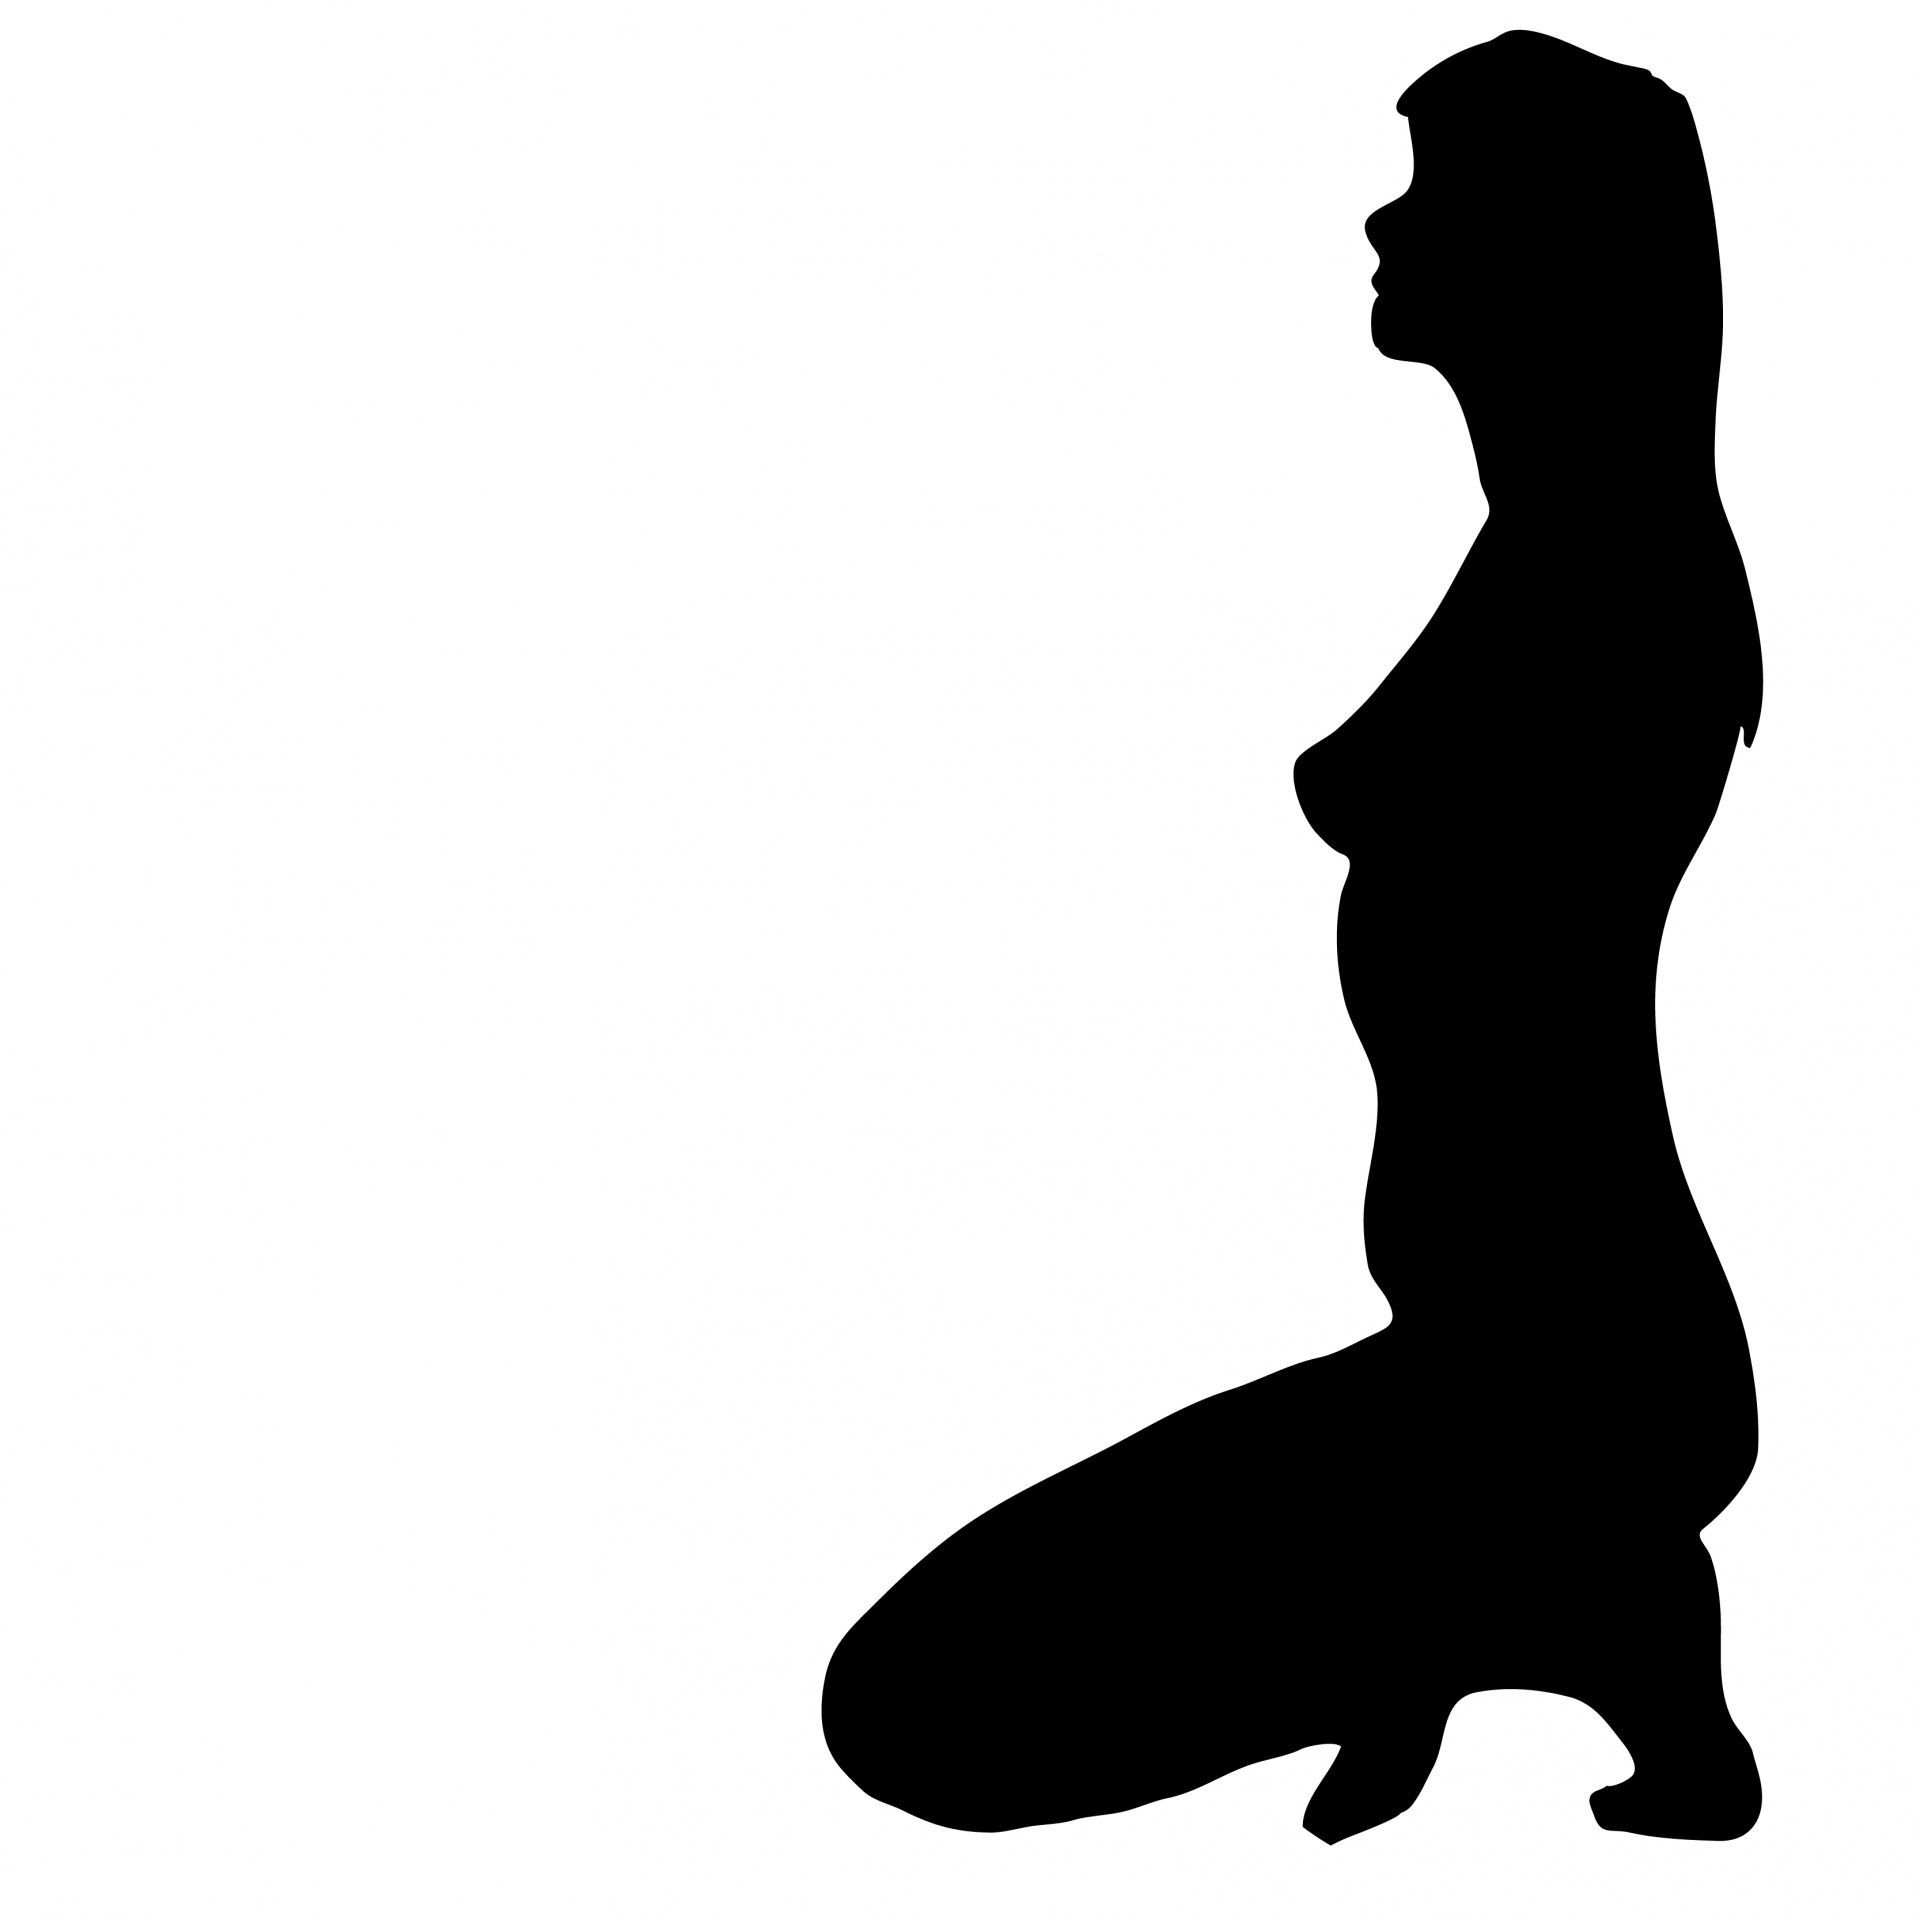 Are mistaken. nude woman silhouette clip art